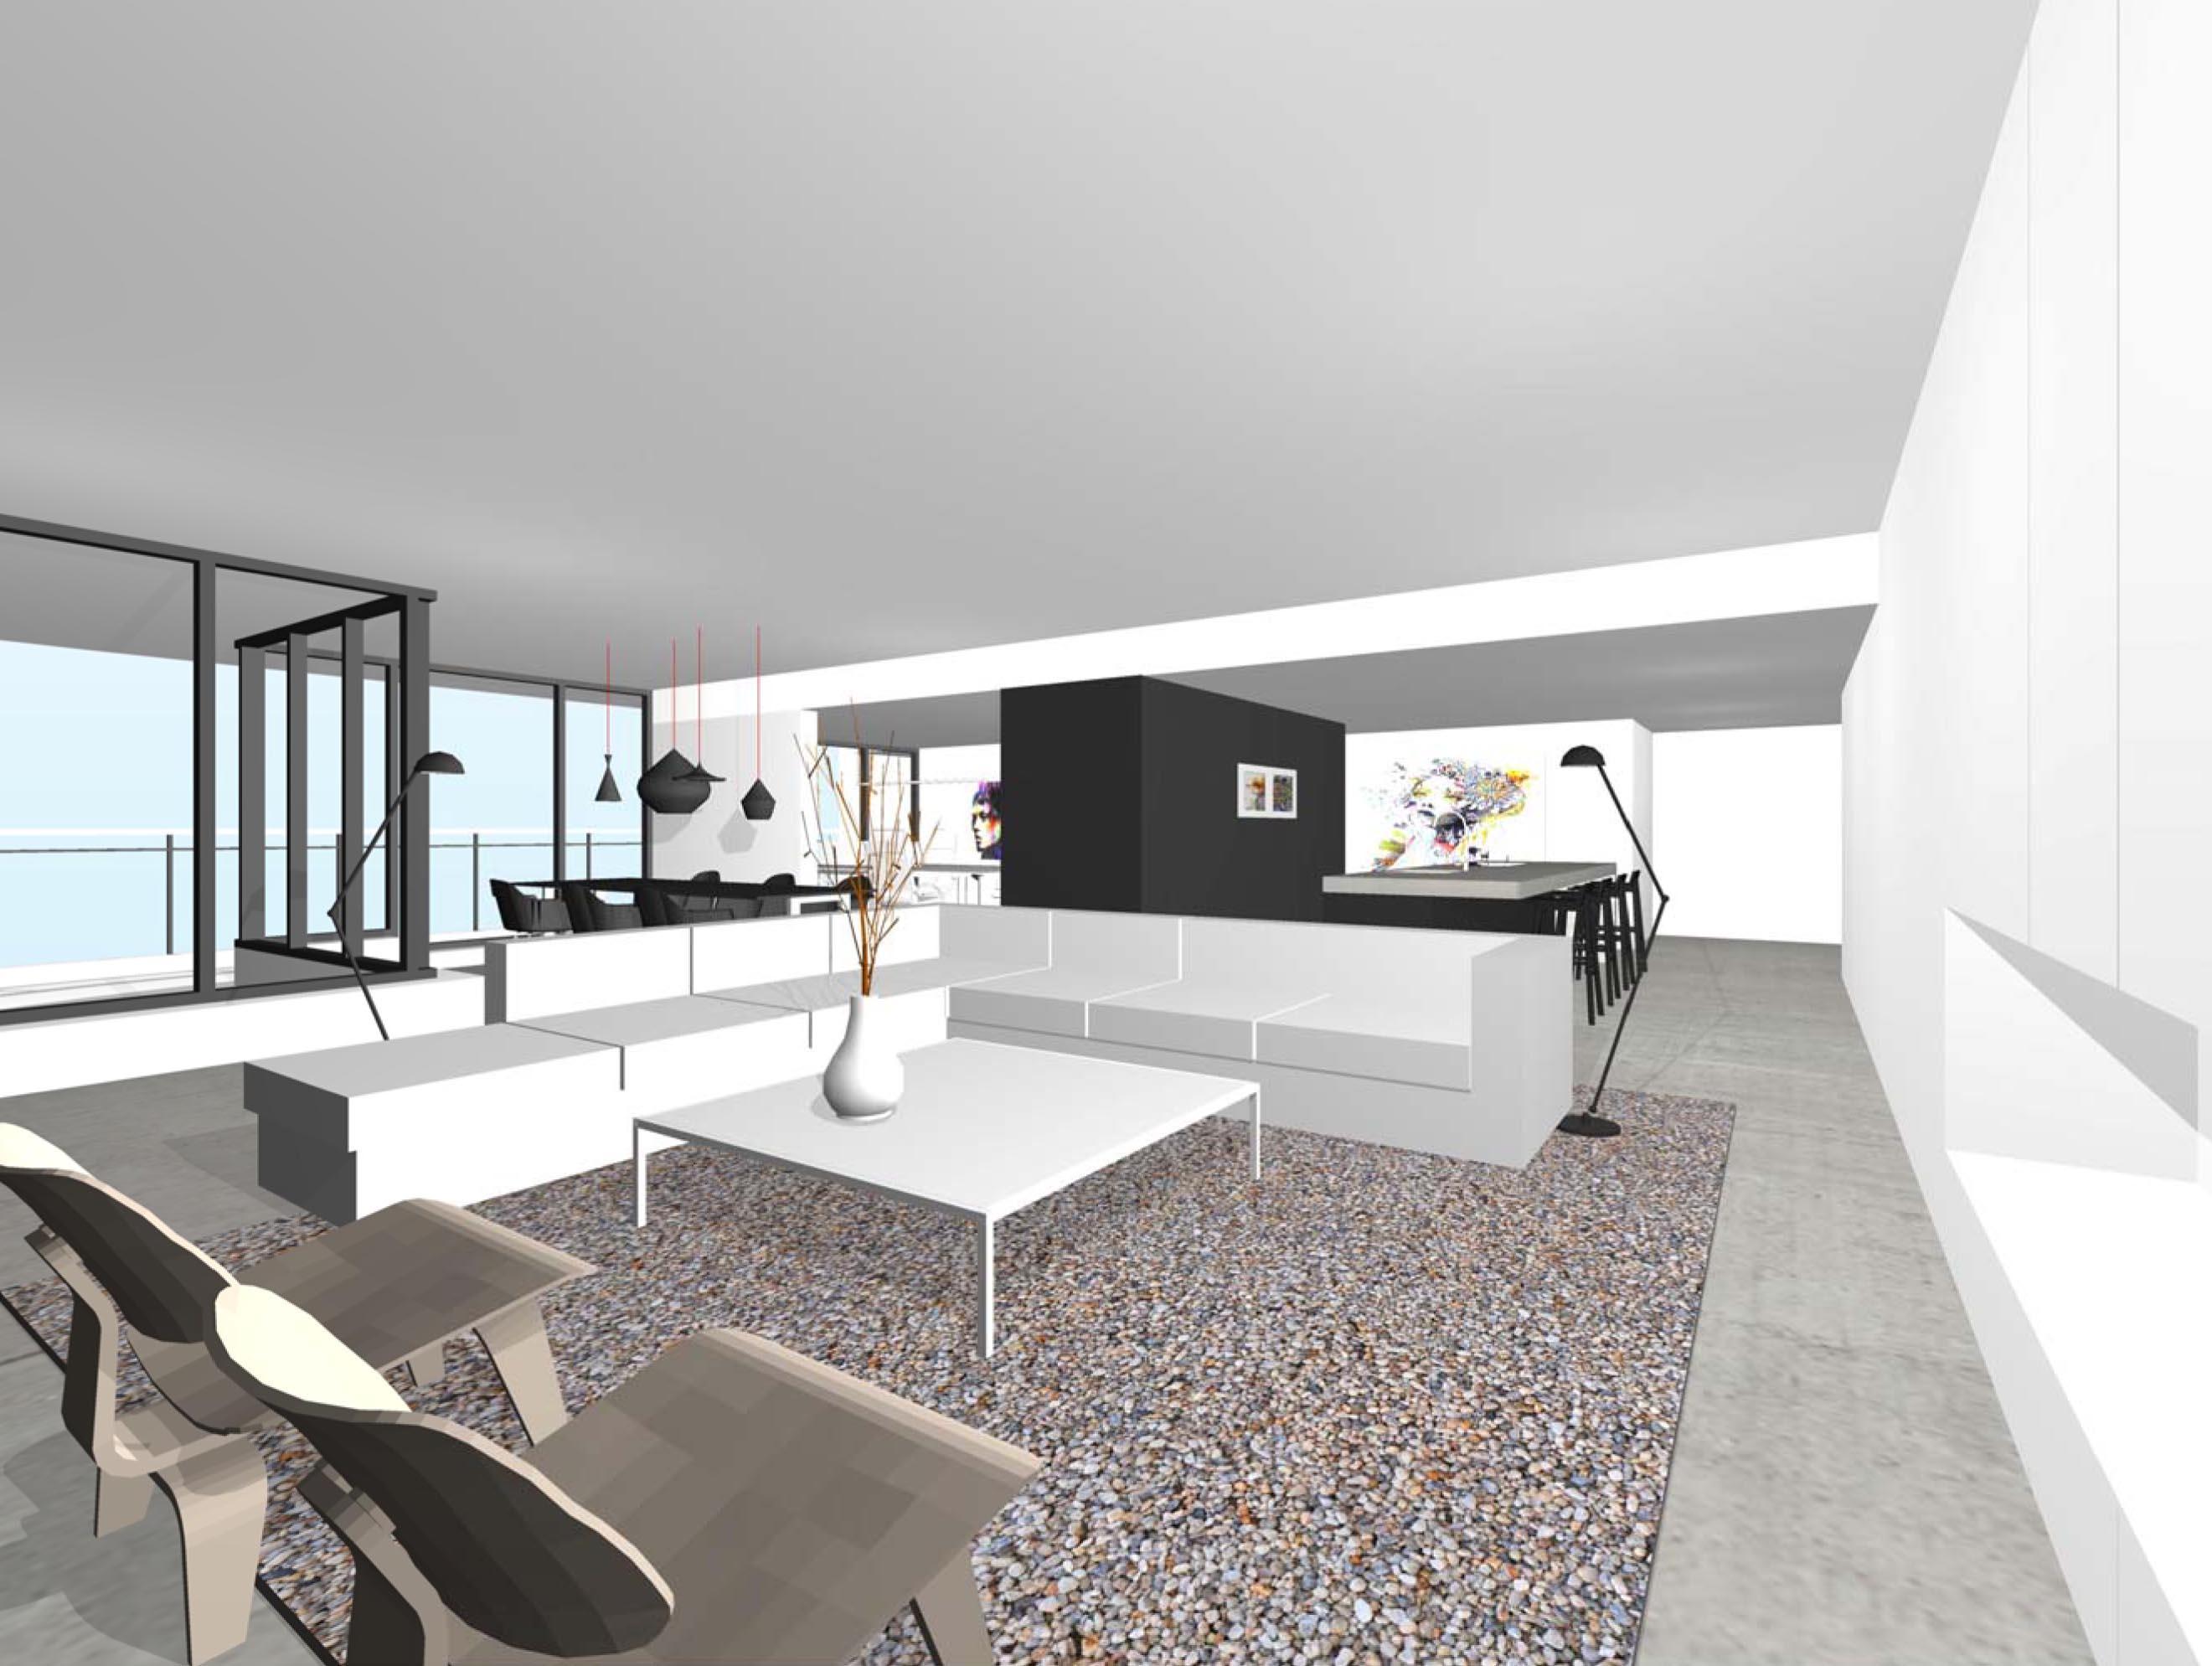 Interieur penthouse alkmaar studio72studio72 - Dachwohnung interieur penthouse ...